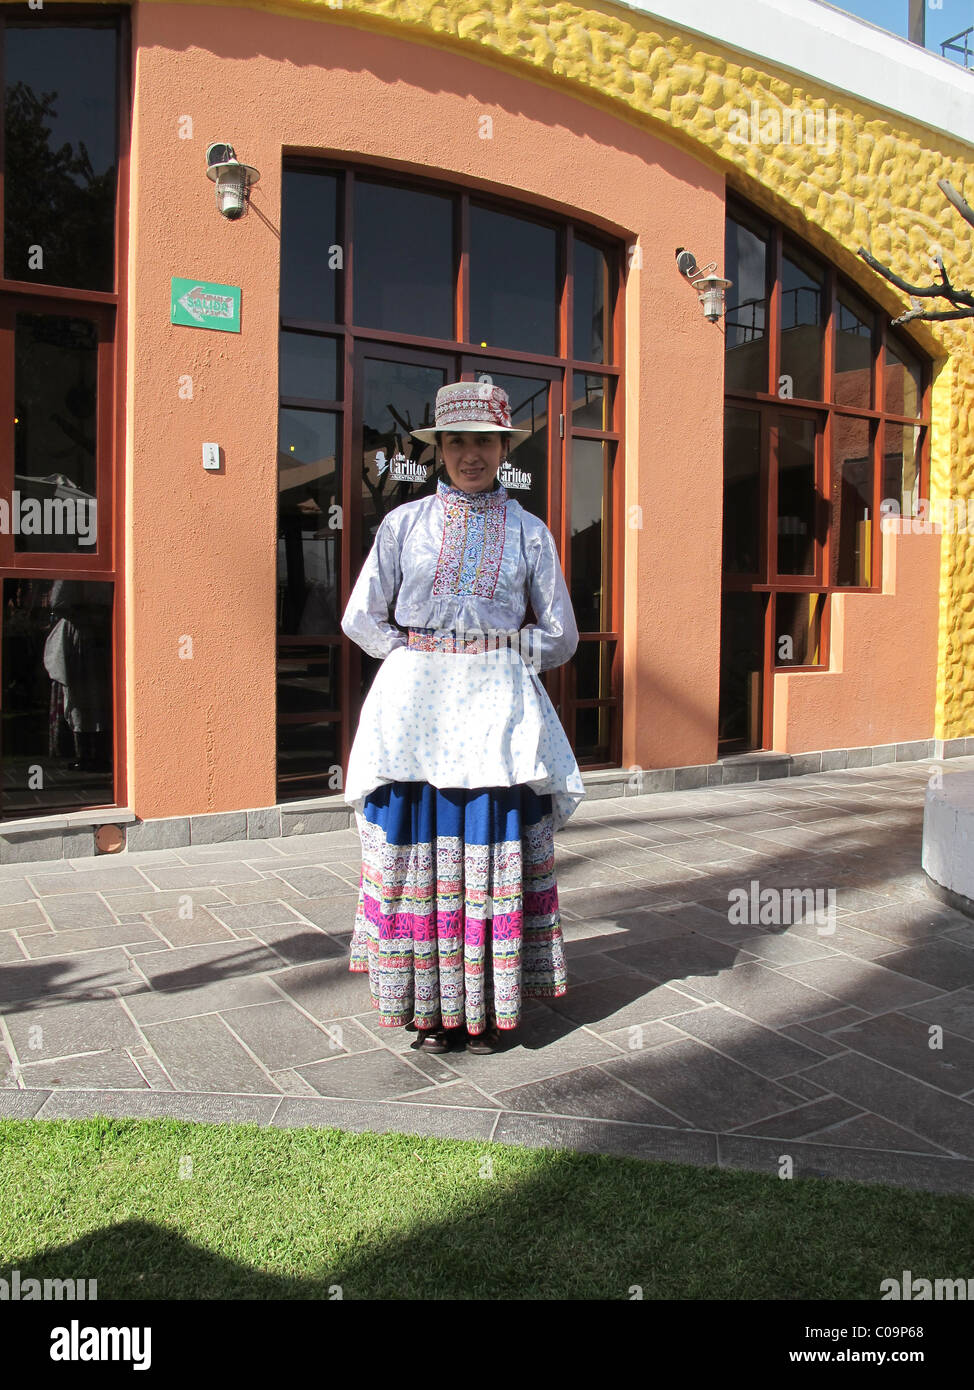 Woman in a traditional dress (traje tipico de Arequipa), Arequipa, Peru Stock Photo